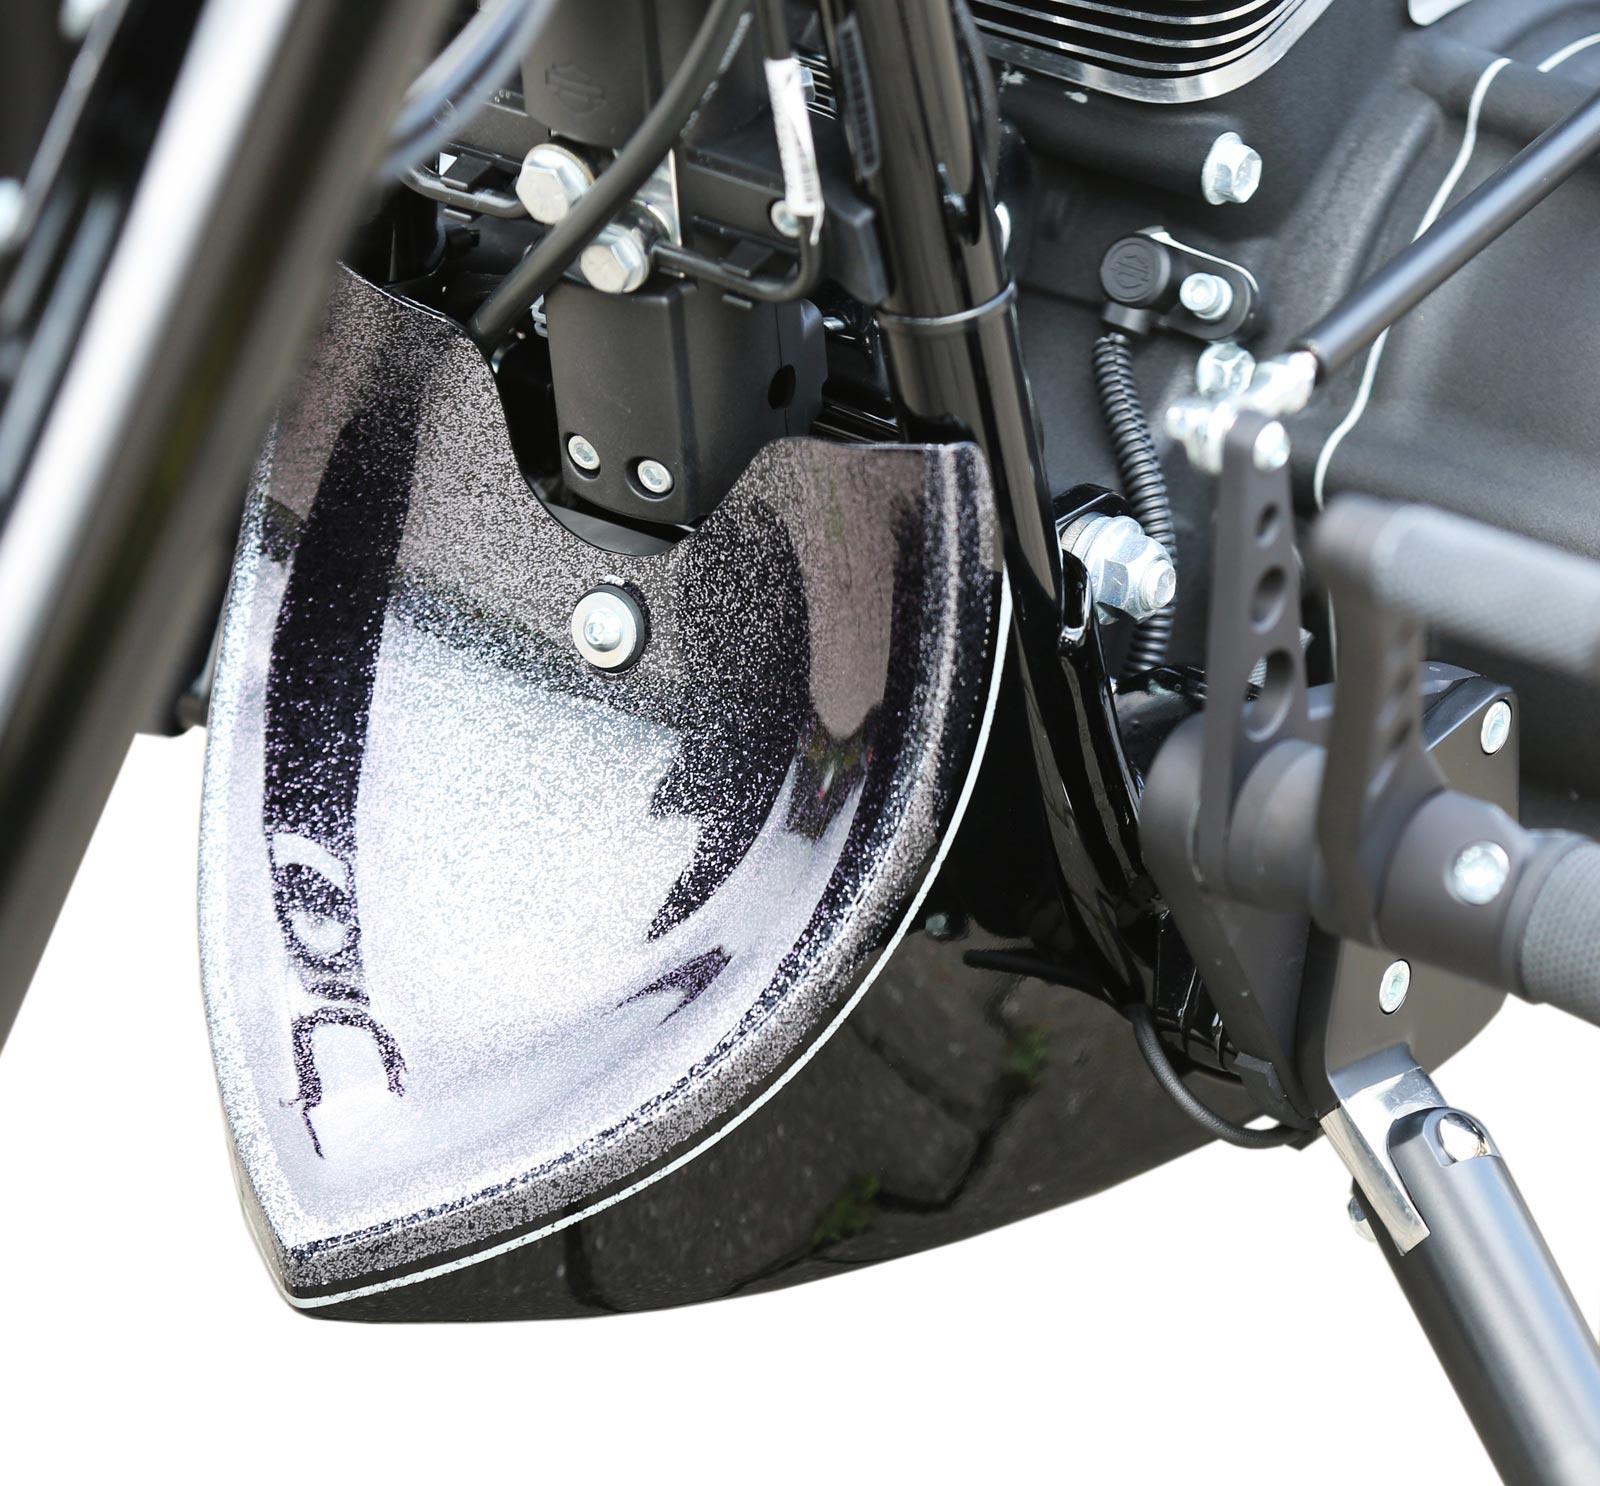 Motogadget m-Blaze Cone Blinker schwarz für 22mm & 1 Zoll Lenker ...